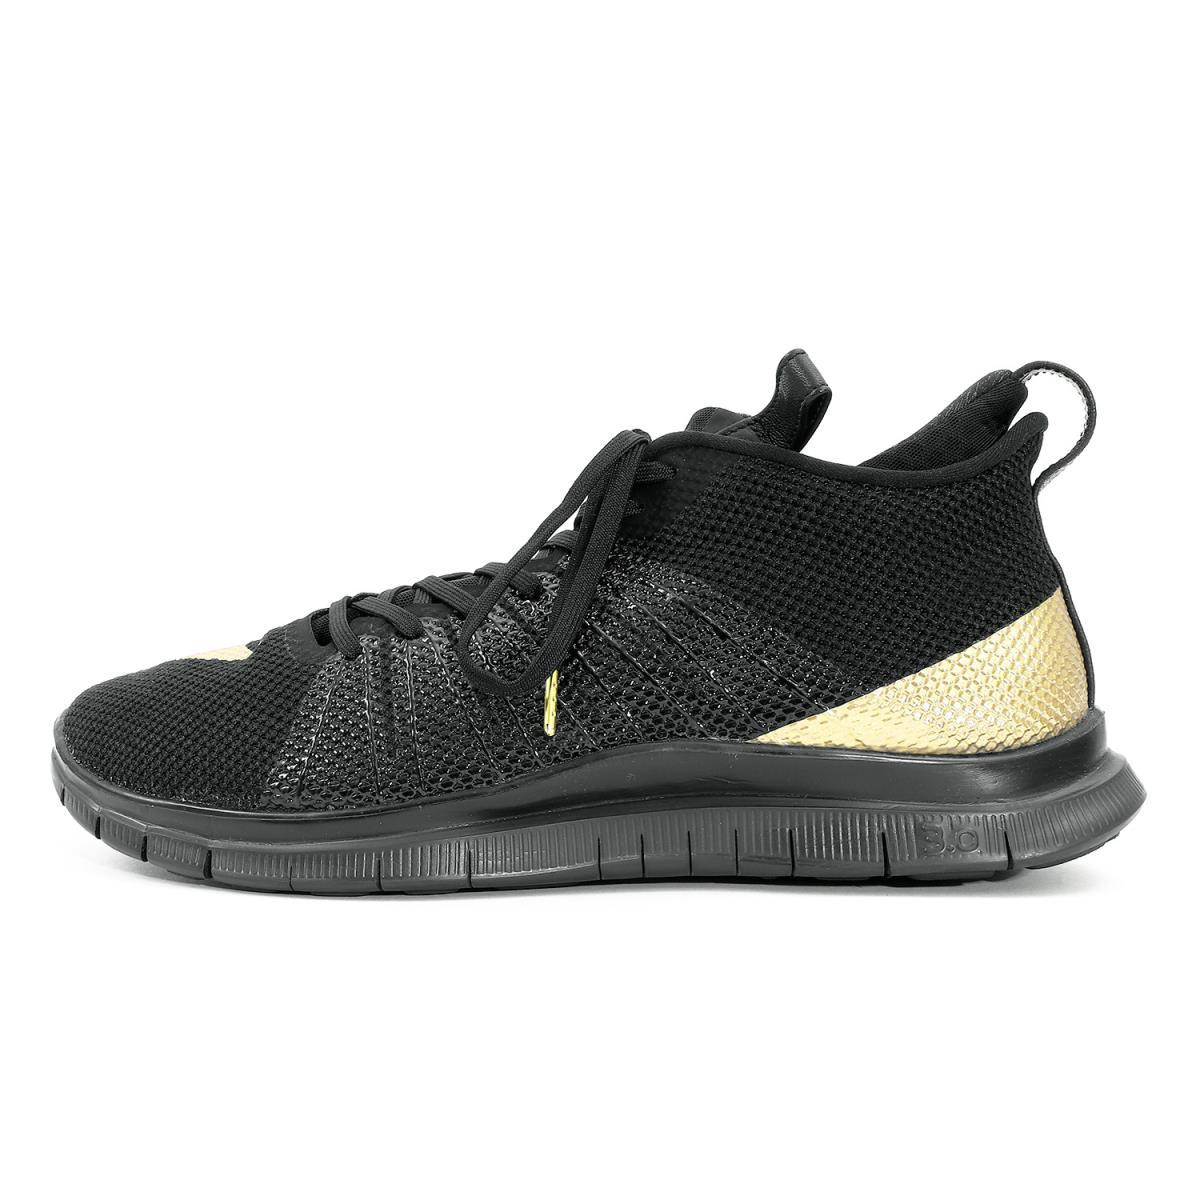 NIKE (ナイキ) ×Olivier Rousteing NikeLab FREE HYPERVENOM 2 (852708-076) ブラック×メタリックゴールド US10(28cm) 【メンズ】【美品】【K2031】【中古】【あす楽☆対応可】